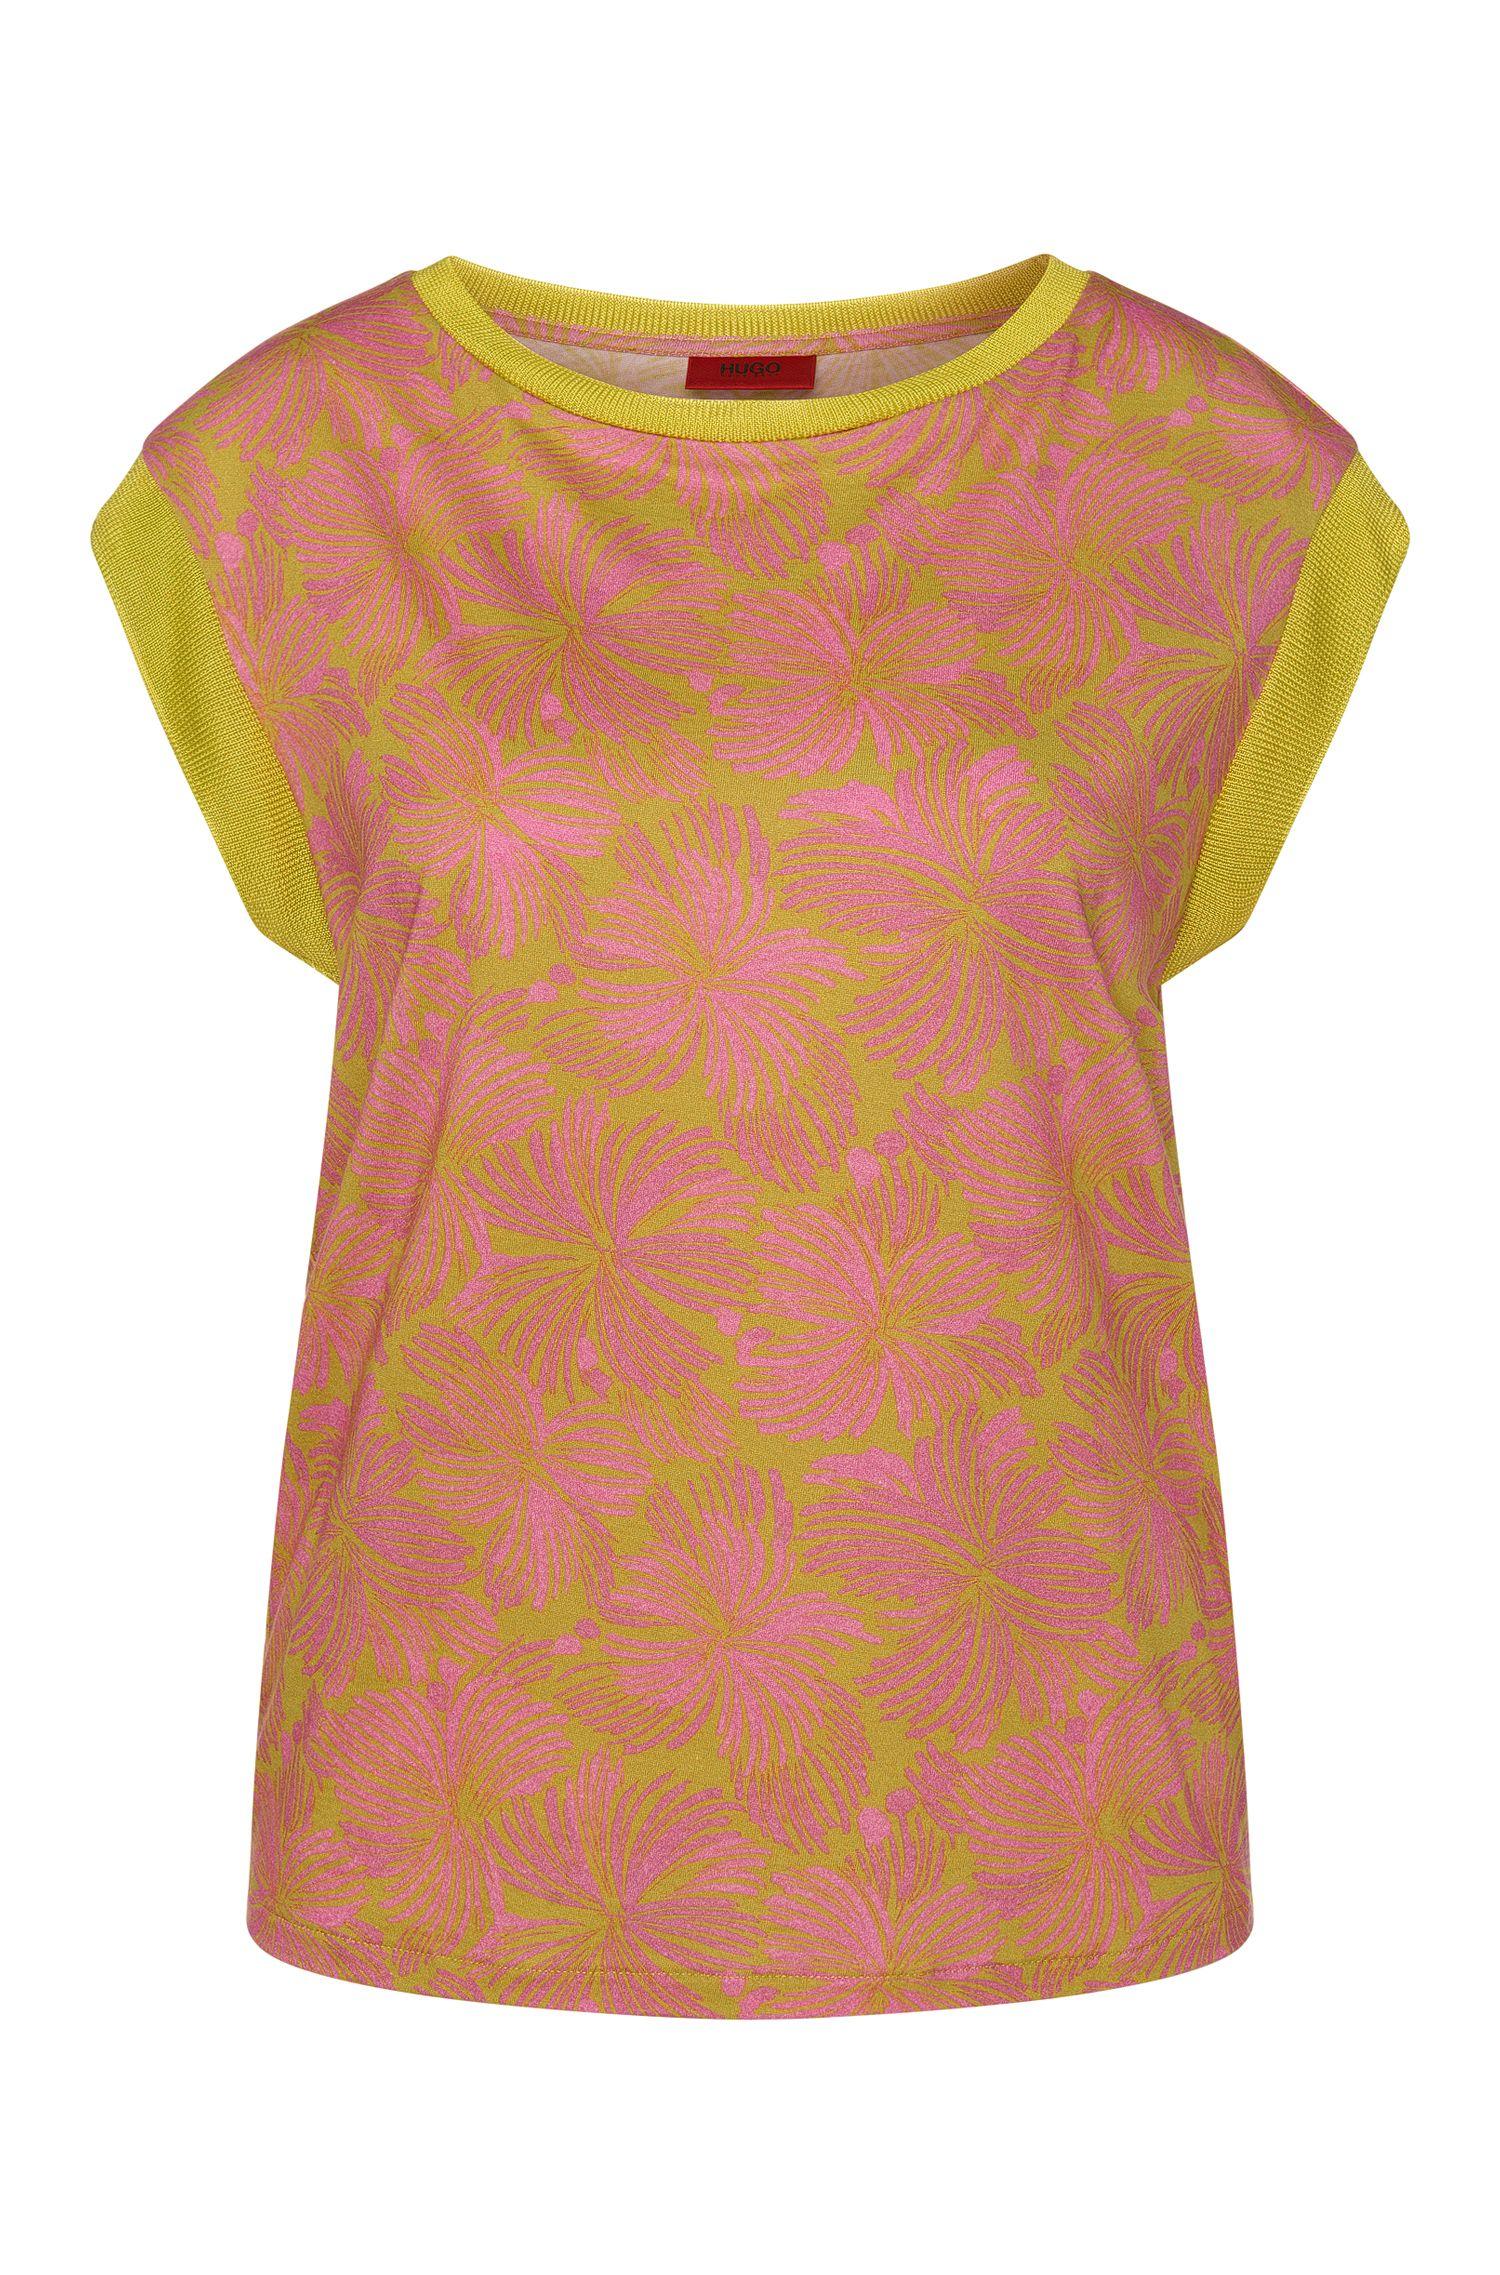 Gemustertes T-Shirt aus Baumwoll-Modal-Mix: 'Derica'